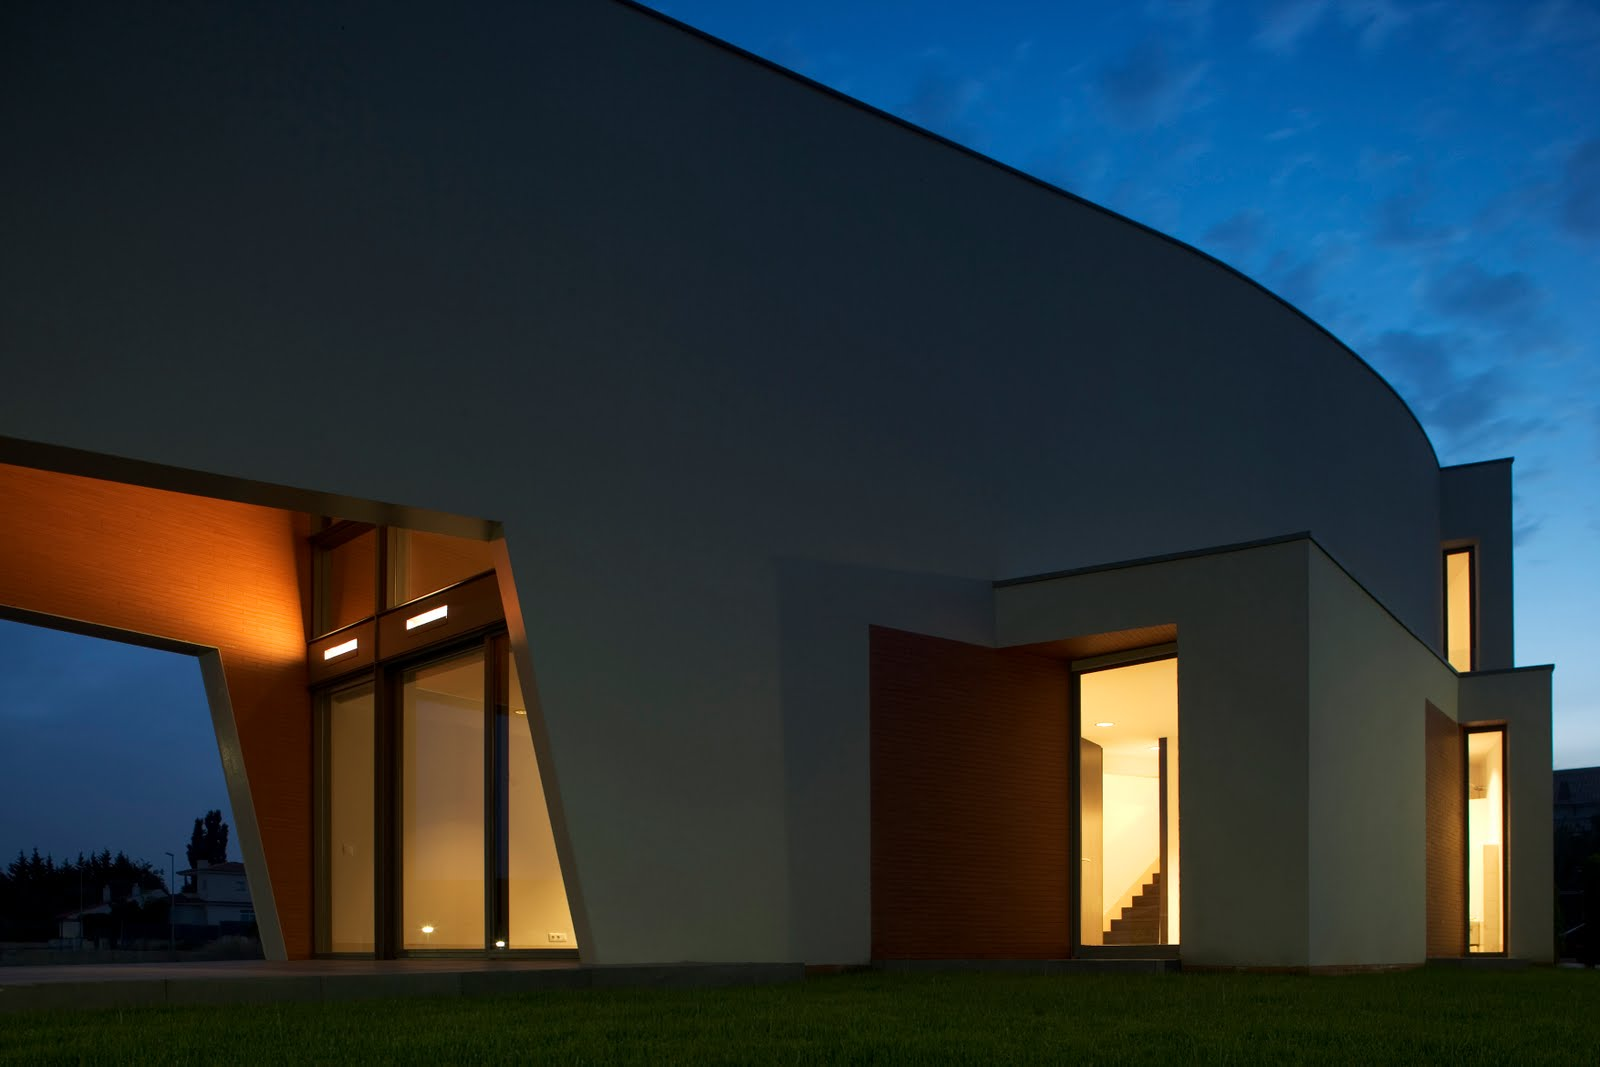 House b matadepera barcelona casa minimalista for Casa minimalista barcelona capital